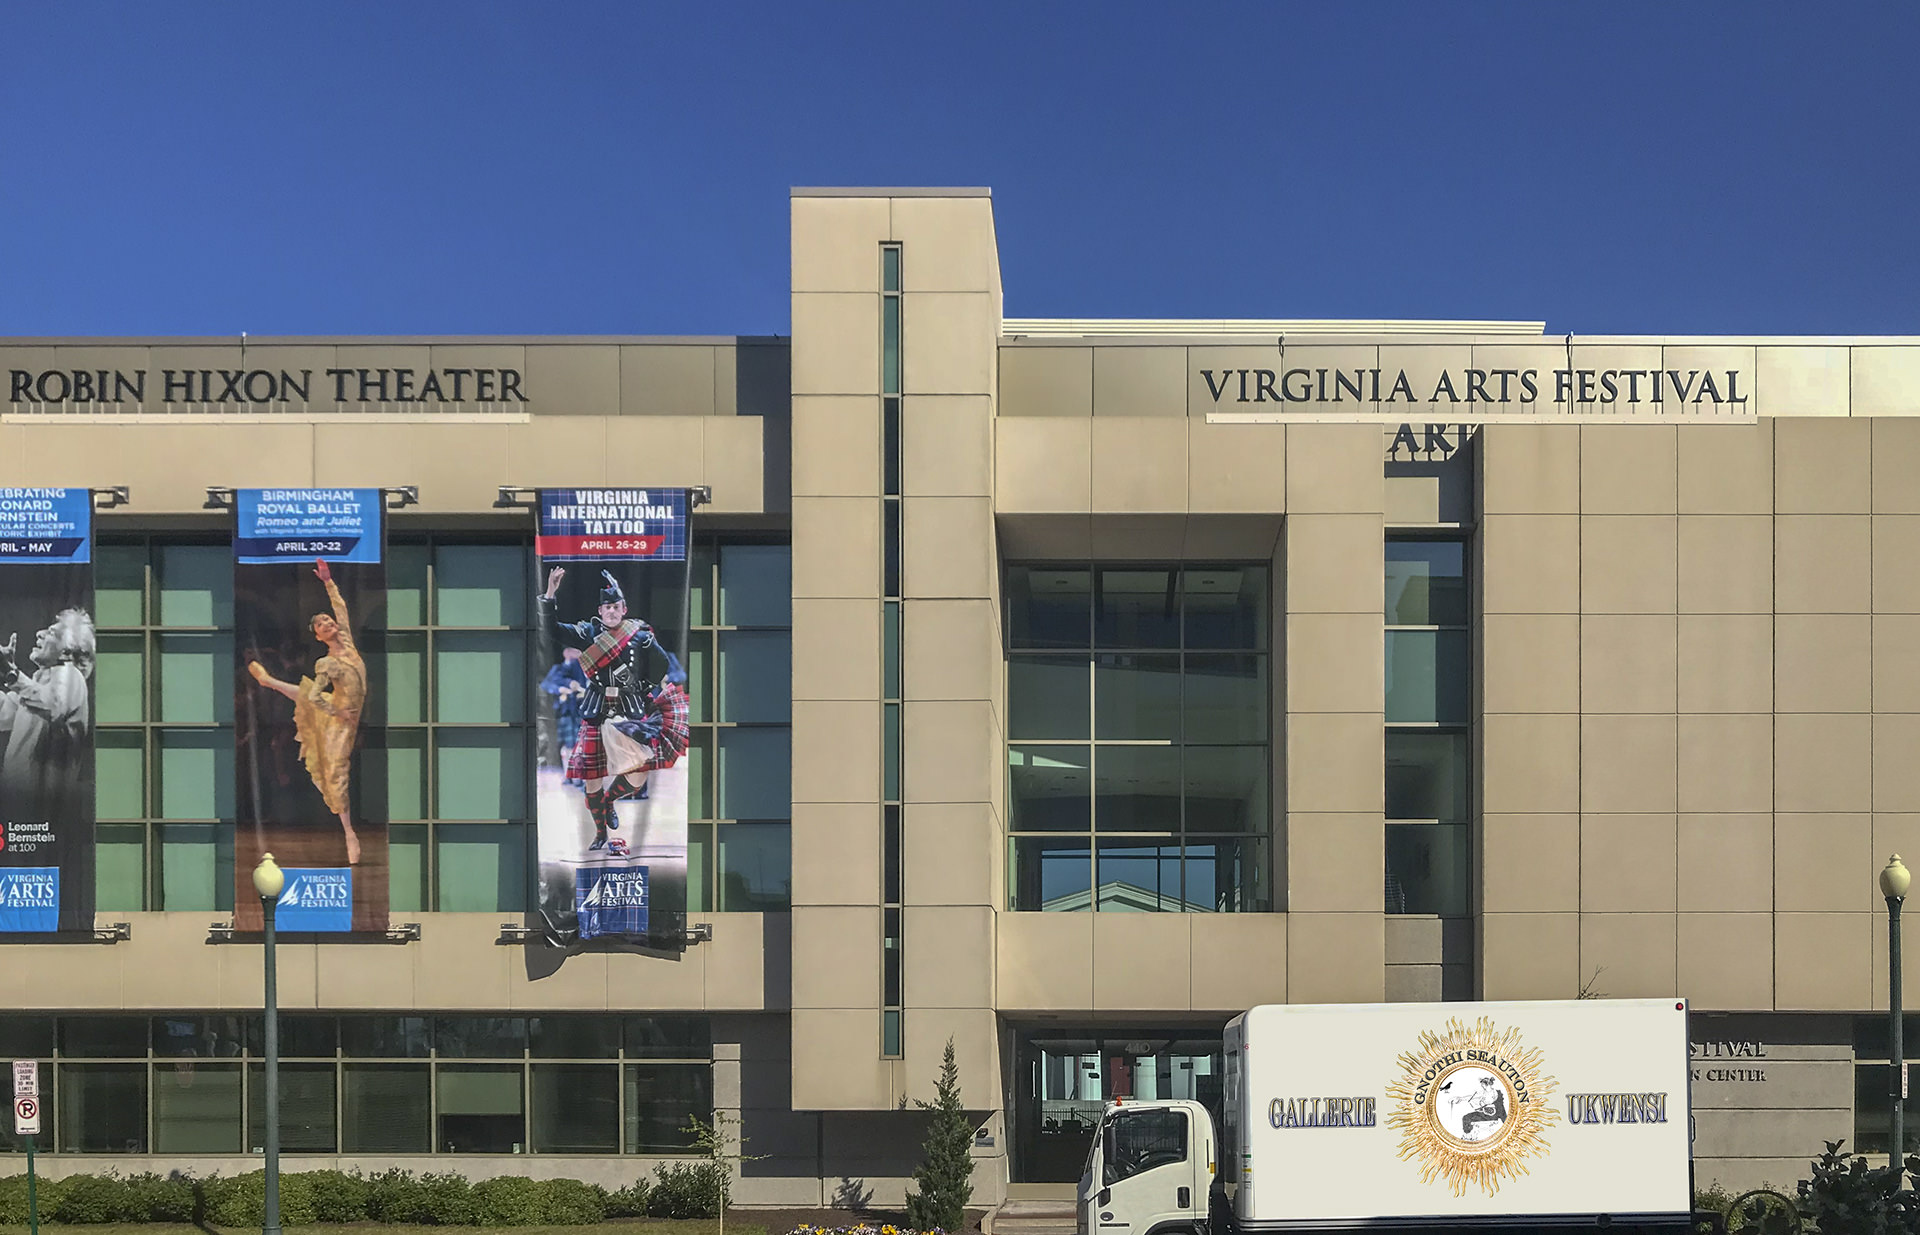 Robin Hixon Theater and Virginia Arts Festival Norfolk VA